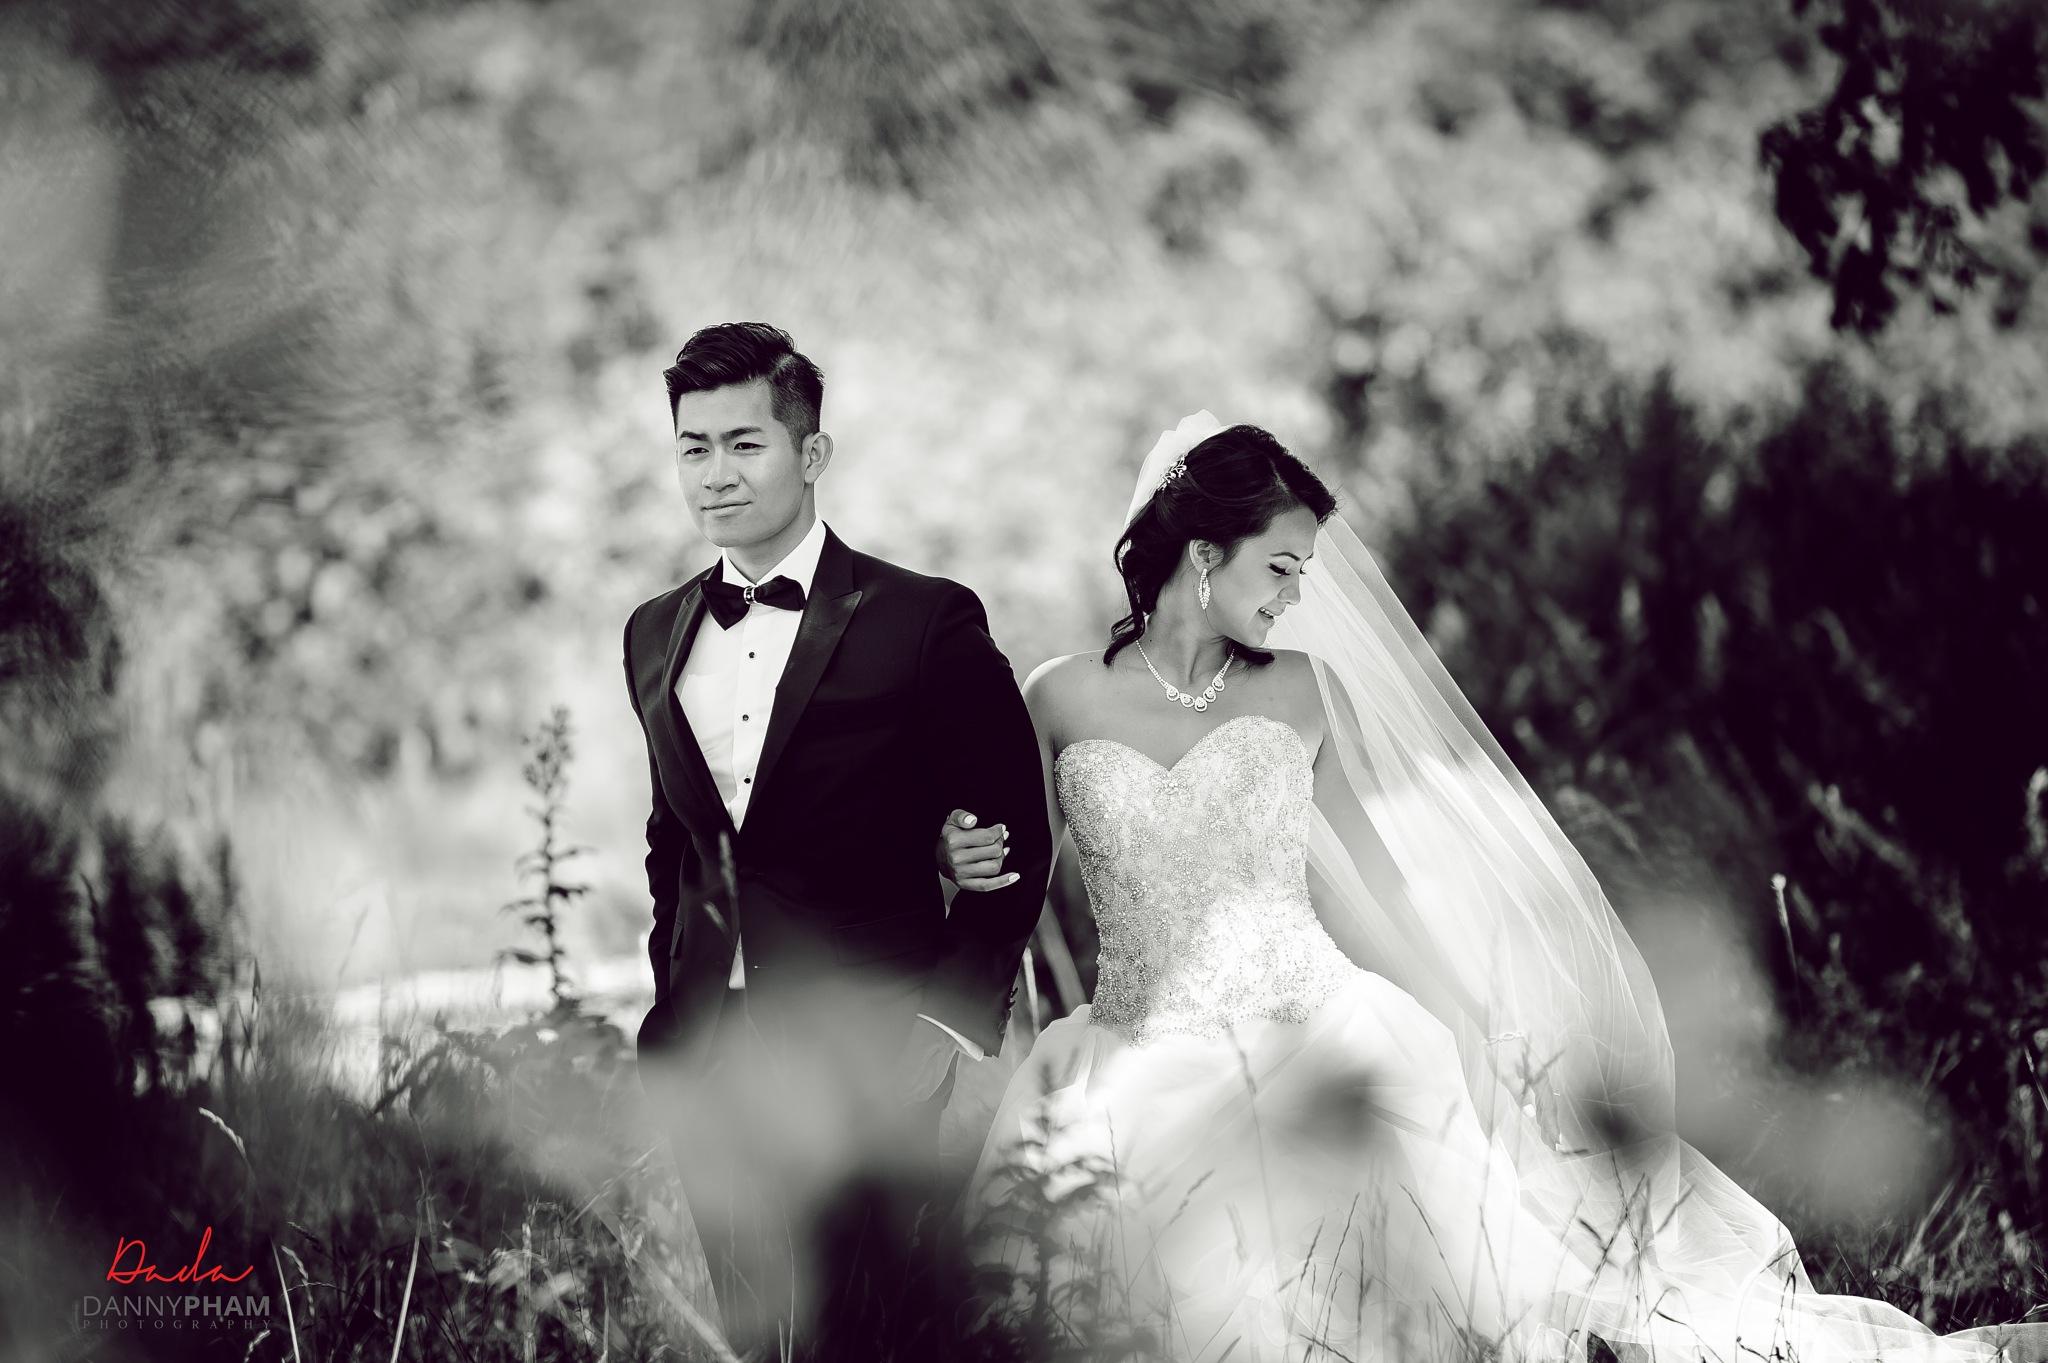 Pre-Wedding... I am a wedding photographer by Danny Pham